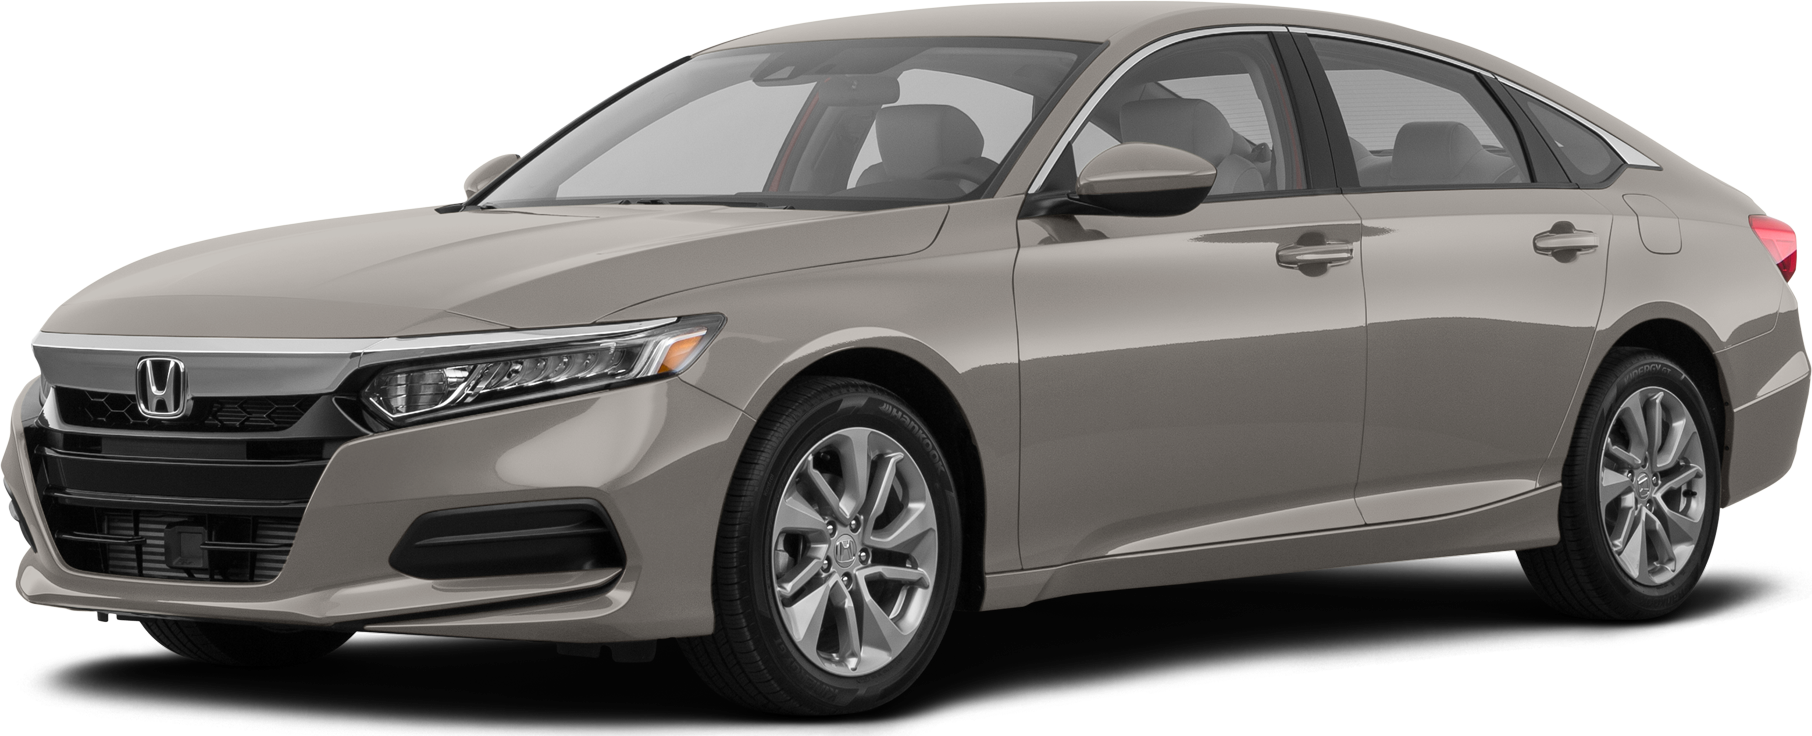 2018 Honda Accord Values Cars For Sale Kelley Blue Book